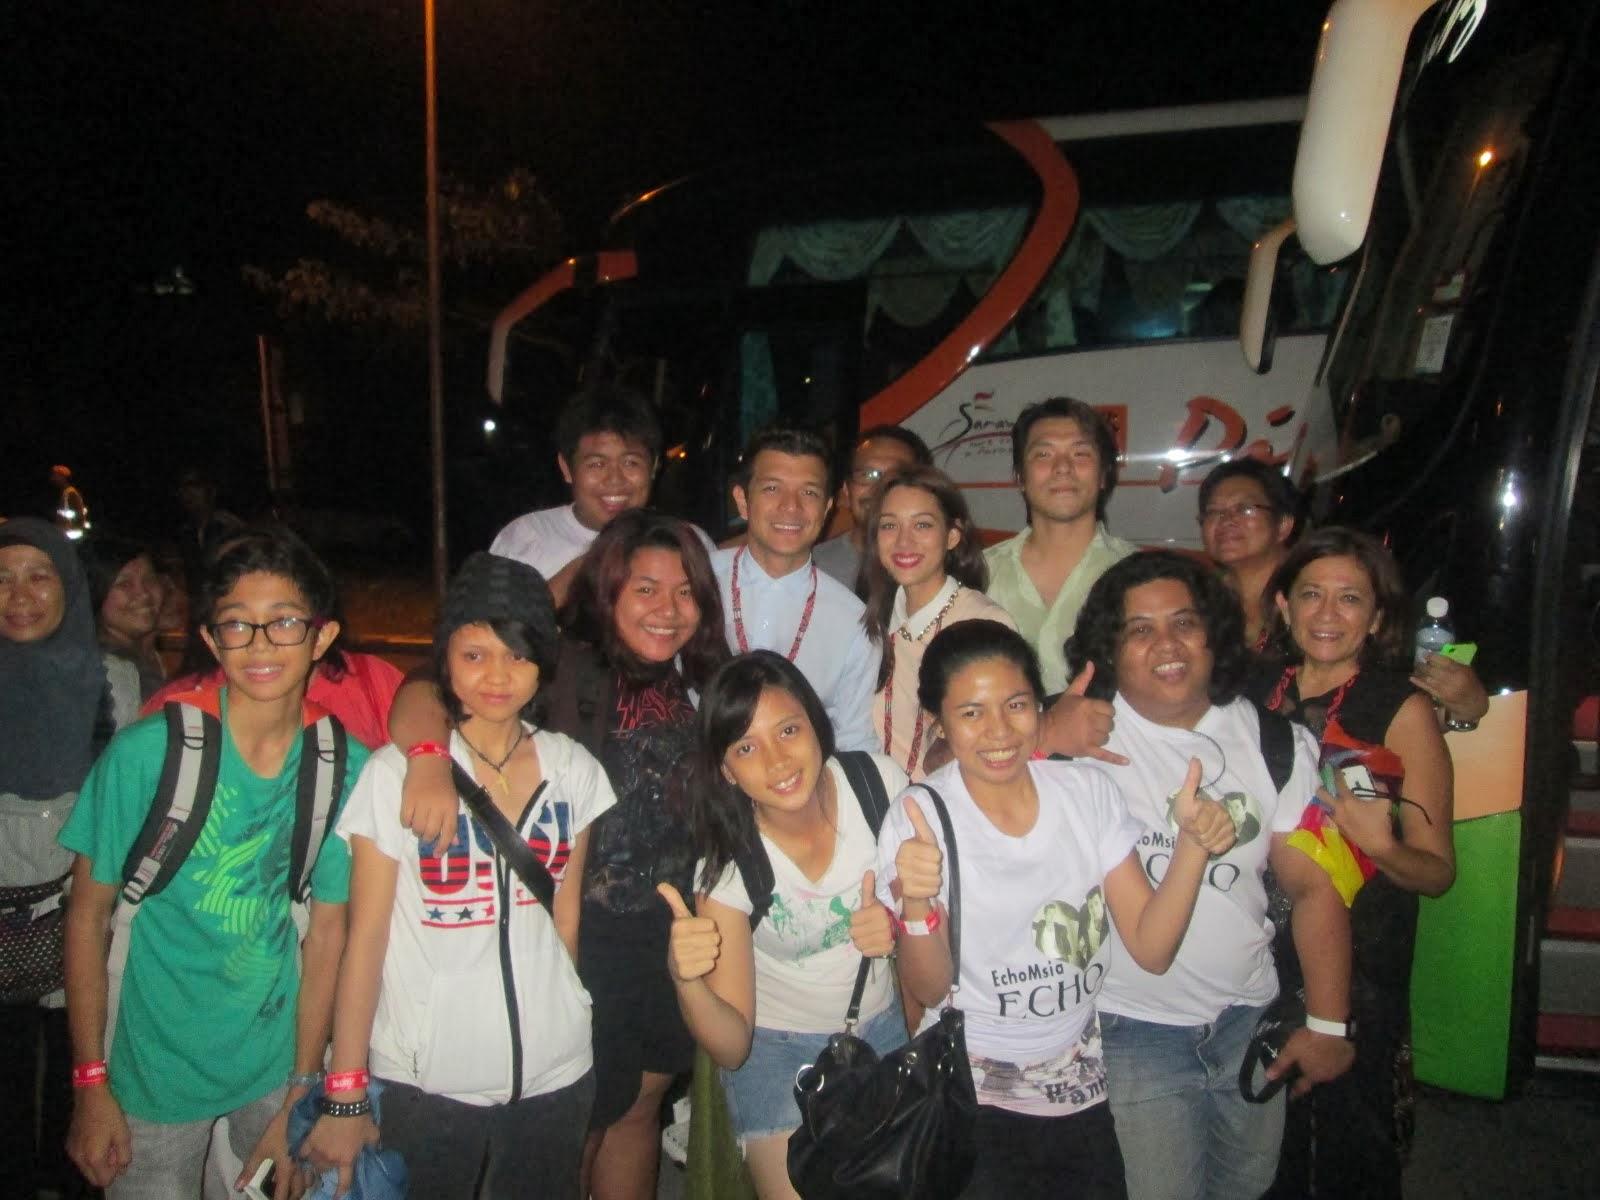 Jericho Rosales & EchoMsia (Sarawak)